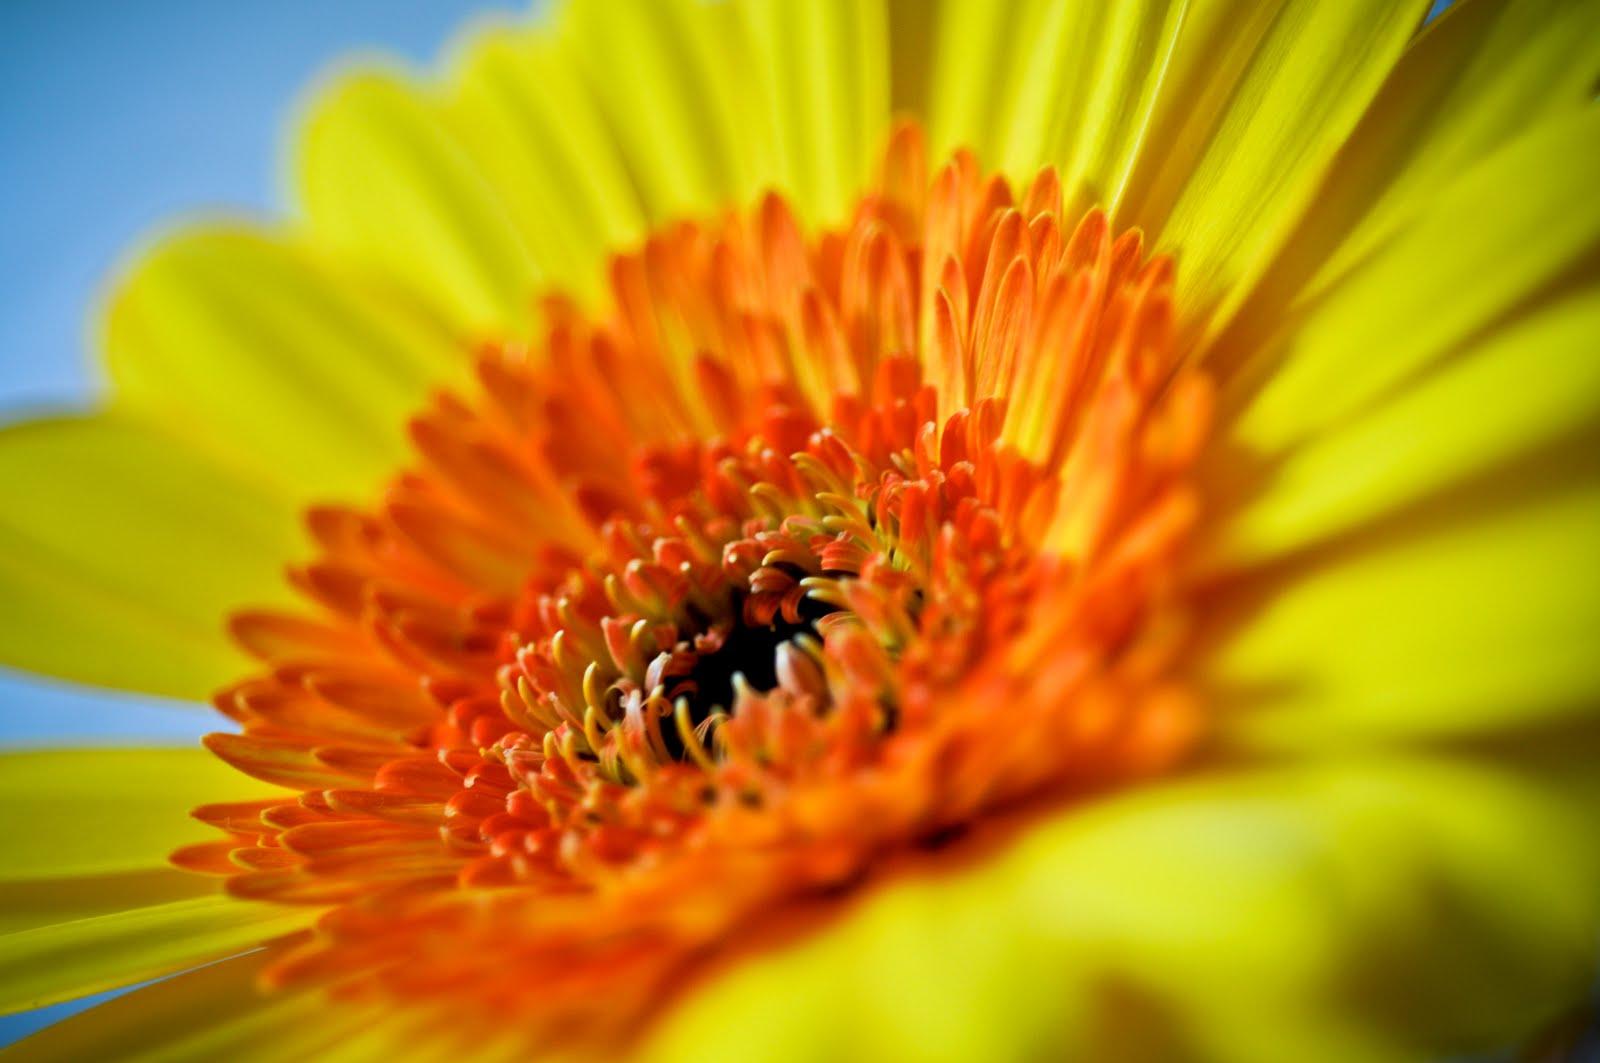 http://1.bp.blogspot.com/_6Ks7mquN8BQ/TNcXWC5b9yI/AAAAAAAAAaU/2-zsO1EA4zc/s1600/springtime.jpg